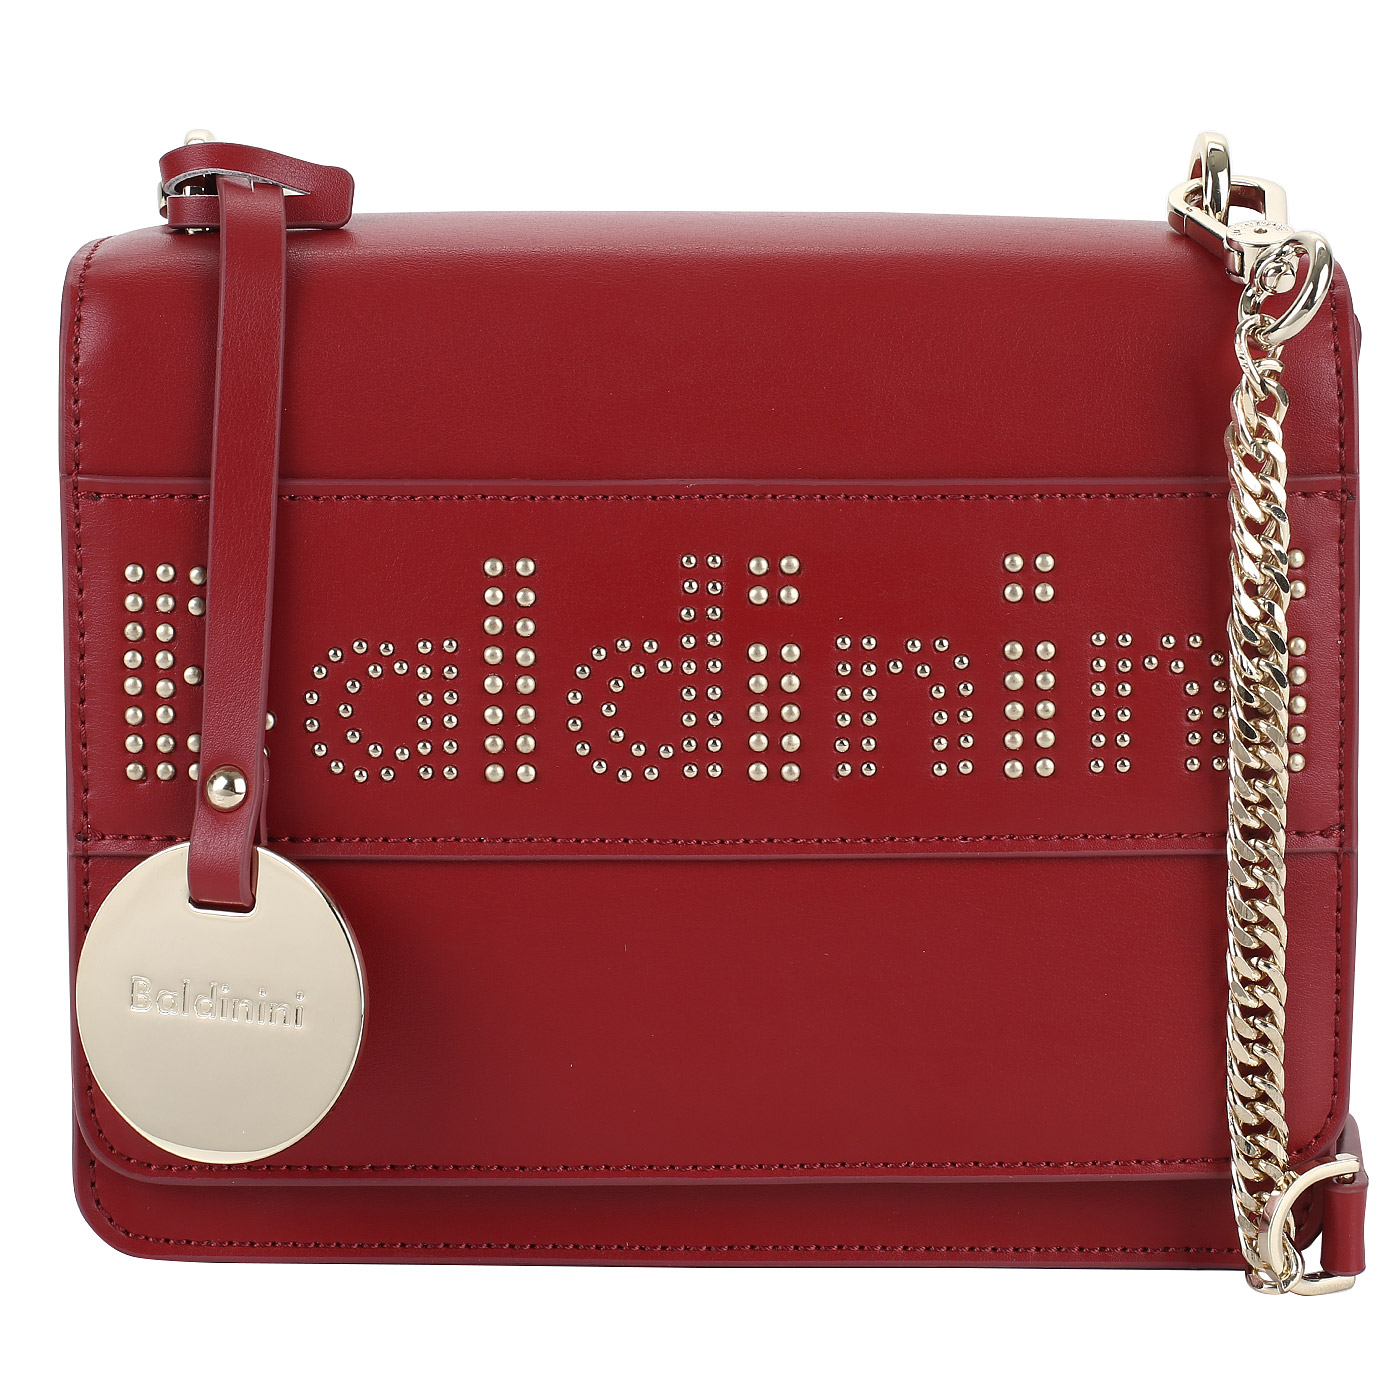 2672ee9b0a44 Красная сумочка Baldinini Clara G83PWG280012_red - 2000557864757 ...